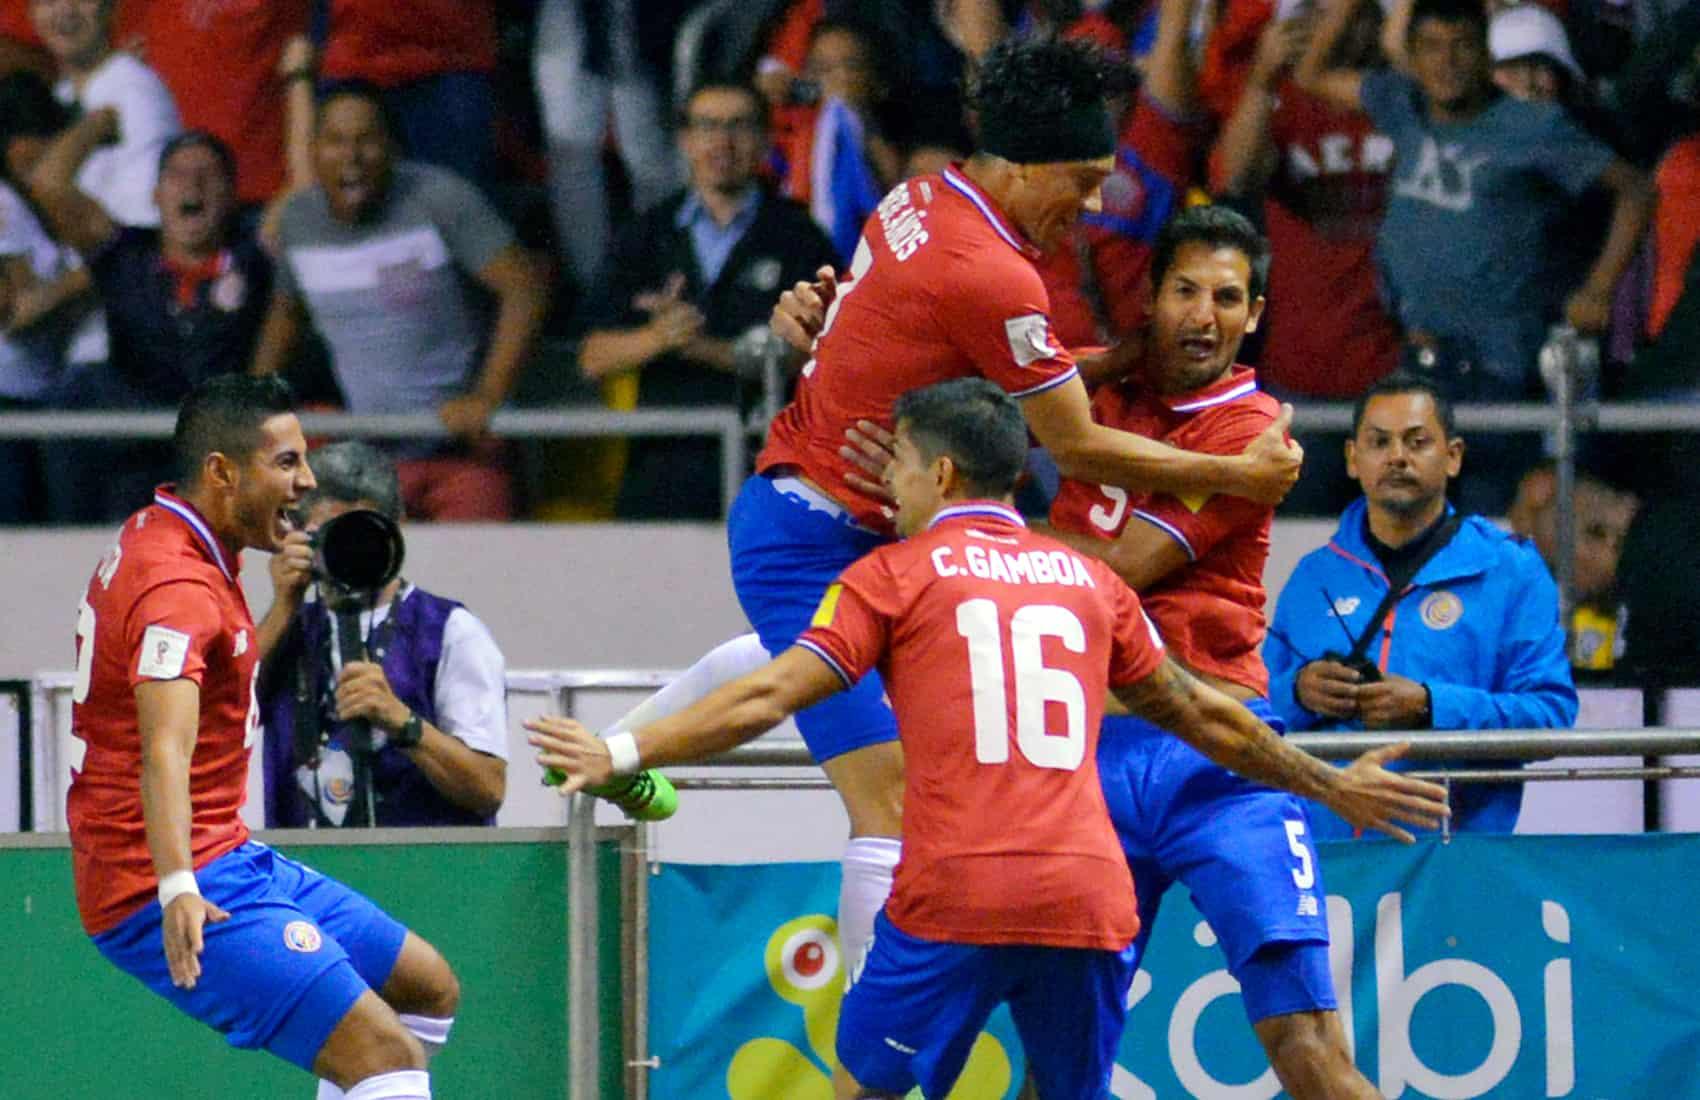 La Sele, Costa Rica's Men National Team